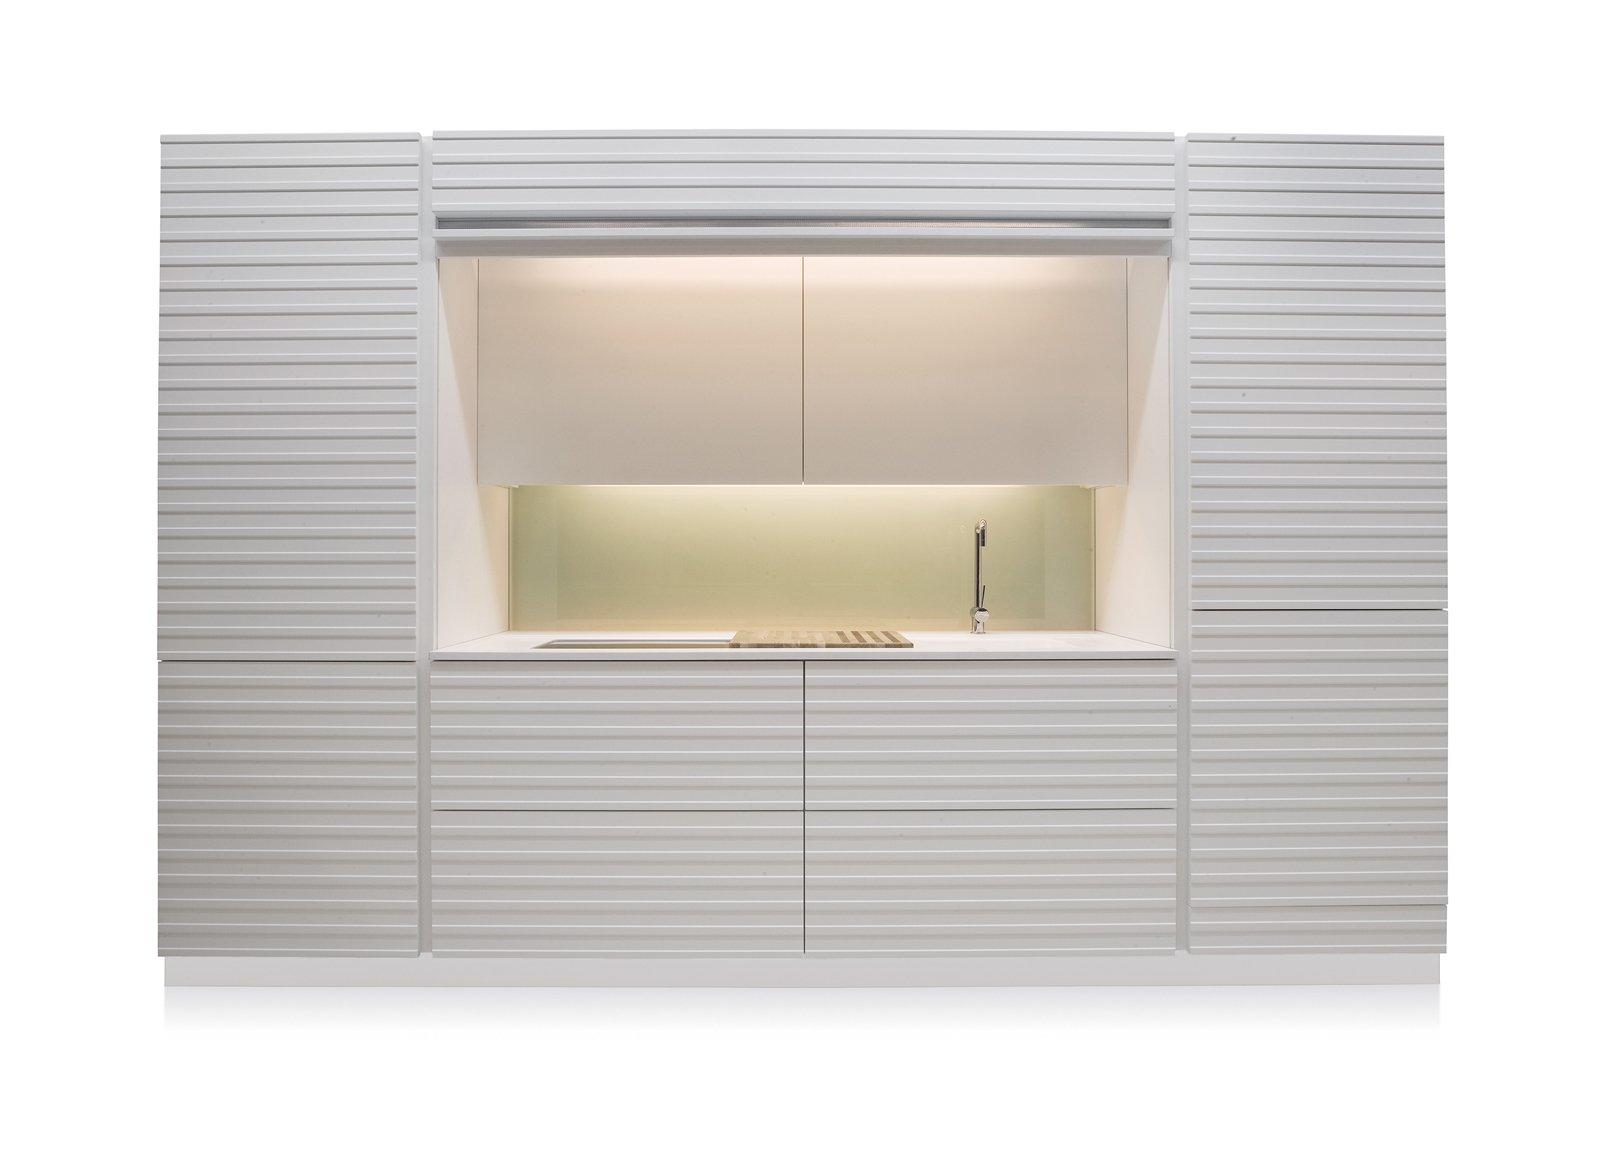 Veneta Cucine O Ikea | madgeweb.com idee di interior design